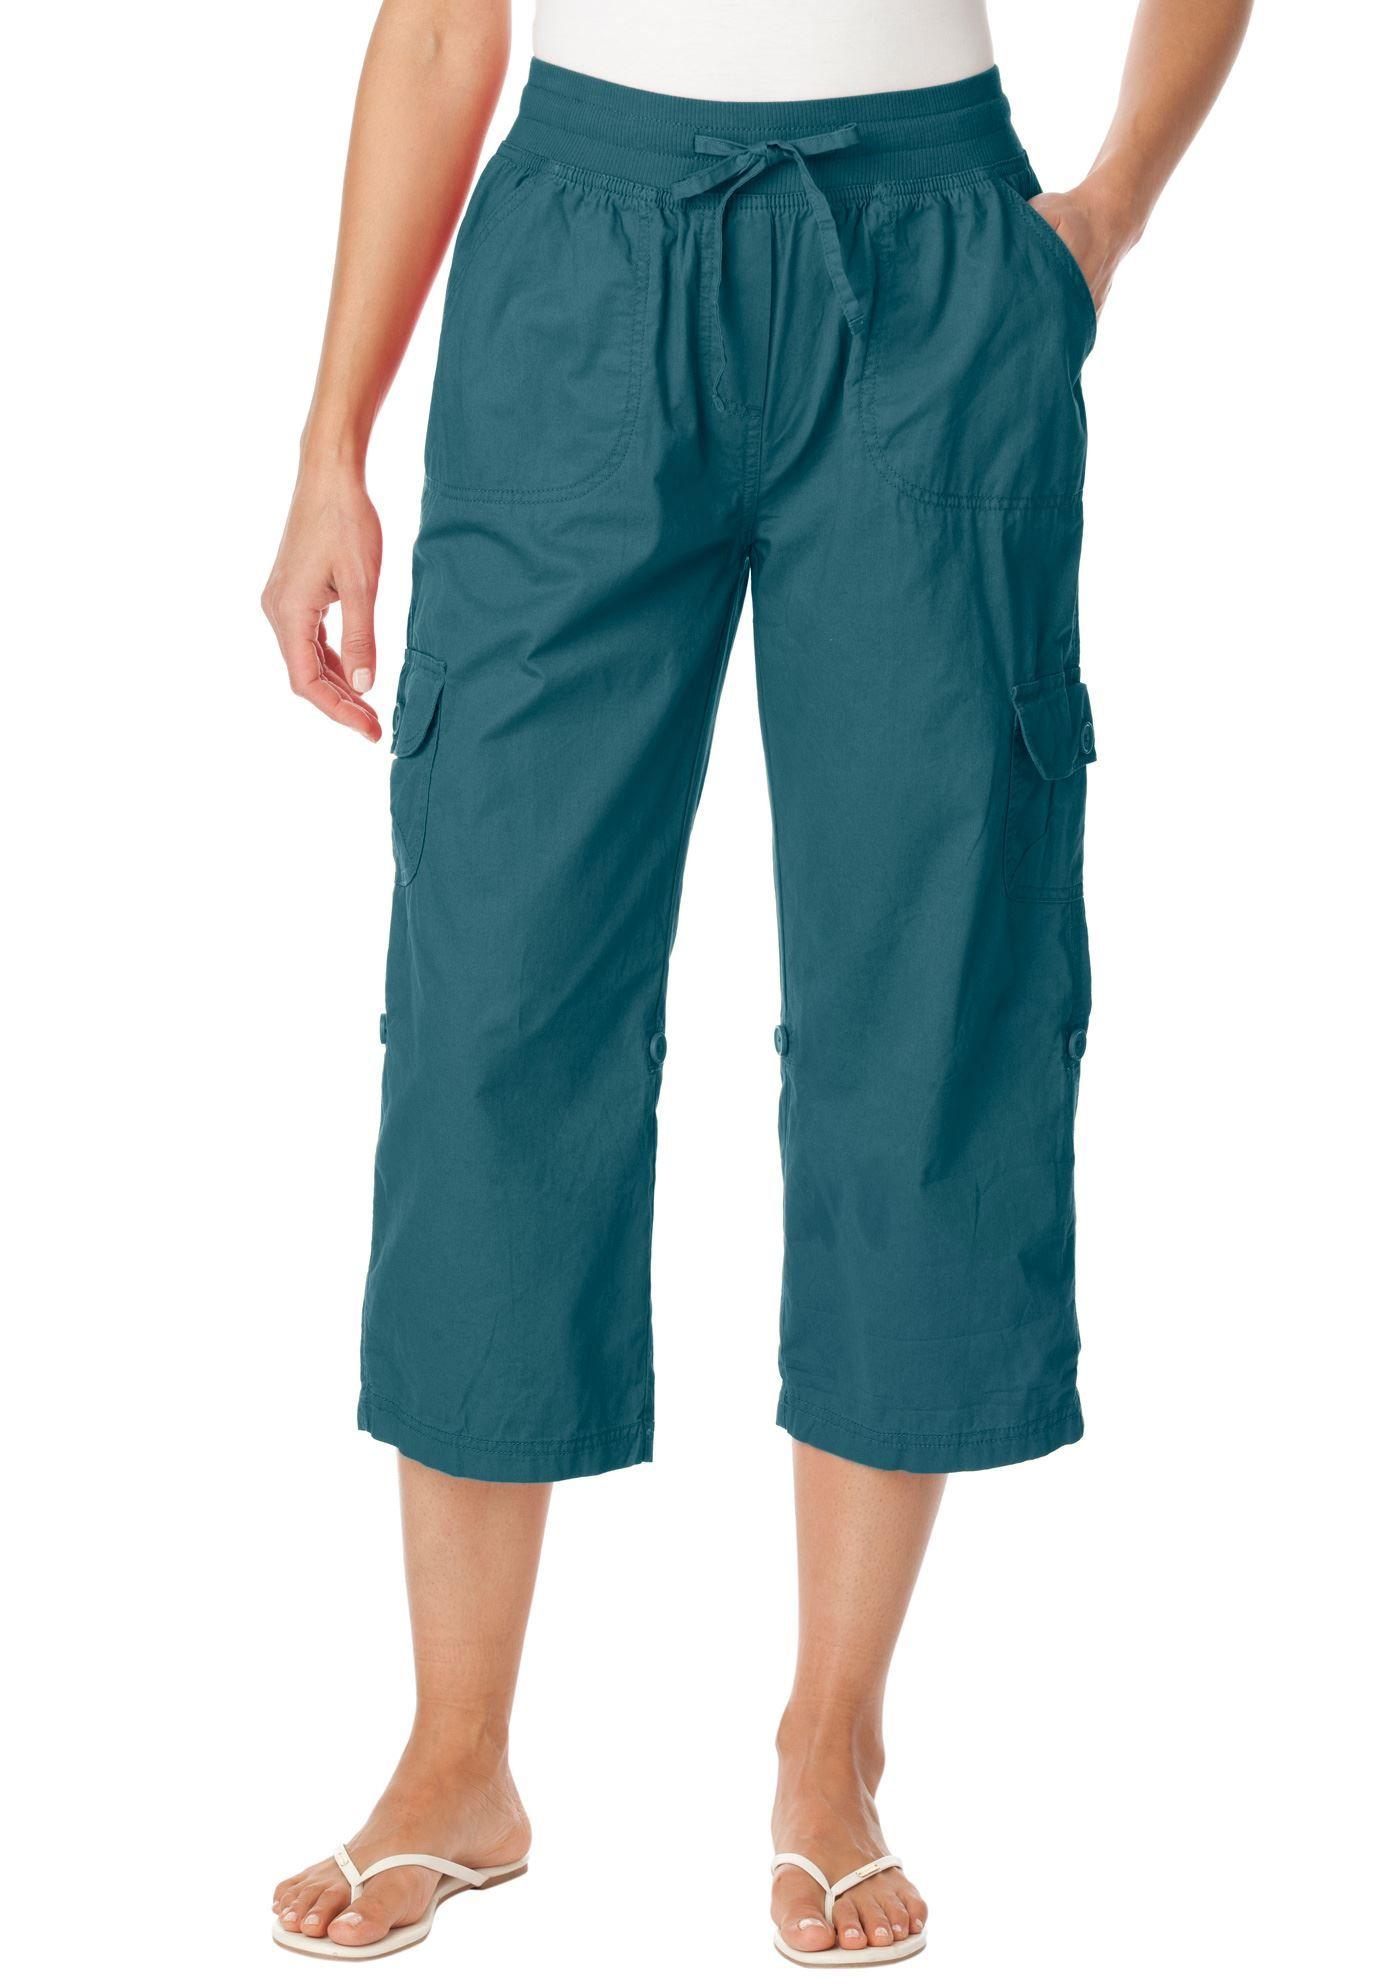 Plus Size Pants, capri style in convertible lengths